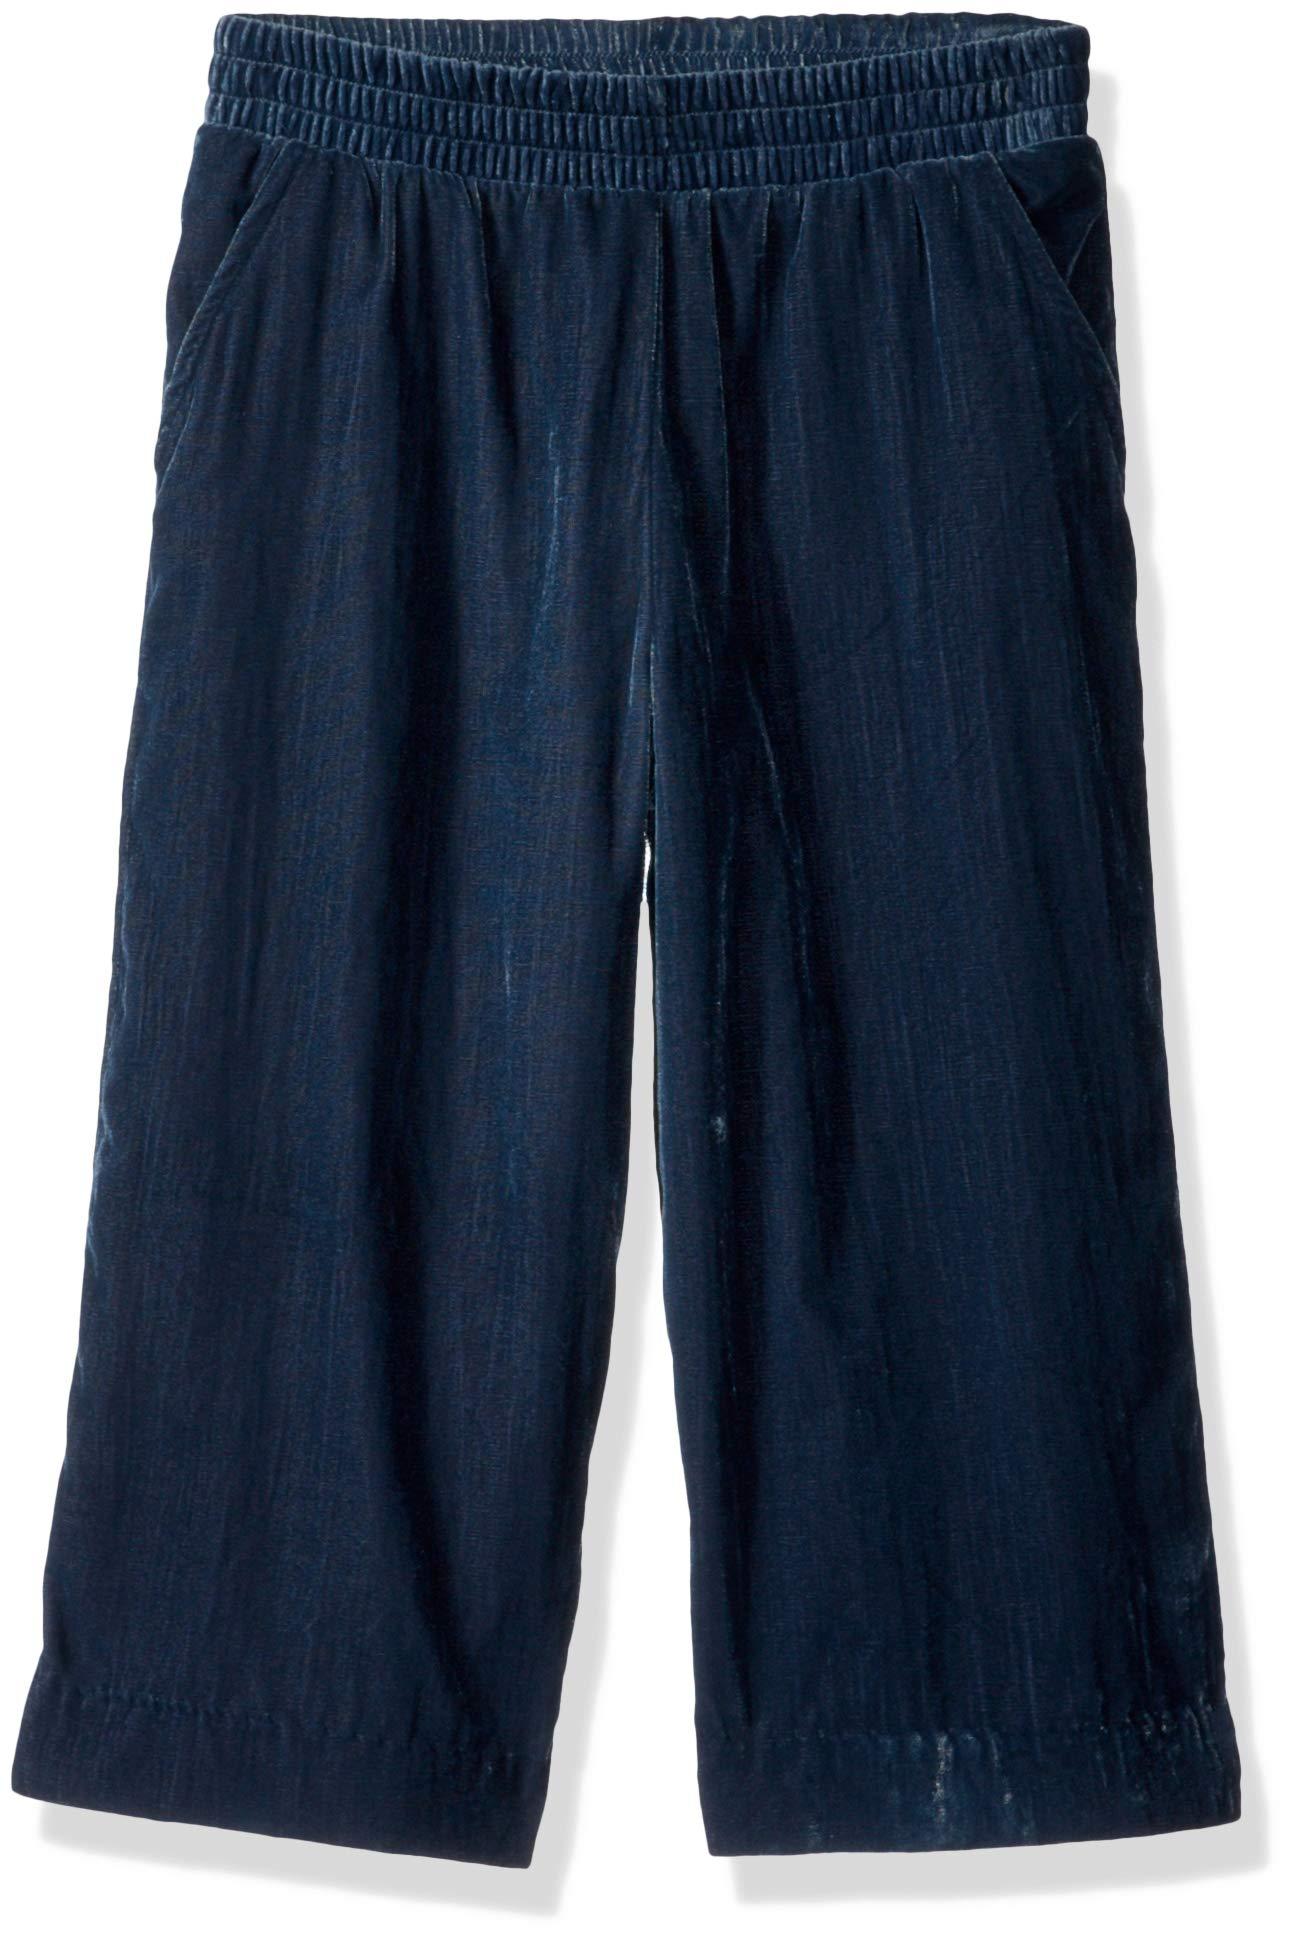 Gymboree Girls' Big Culotte Pants, Frosty Cord Blue, XS